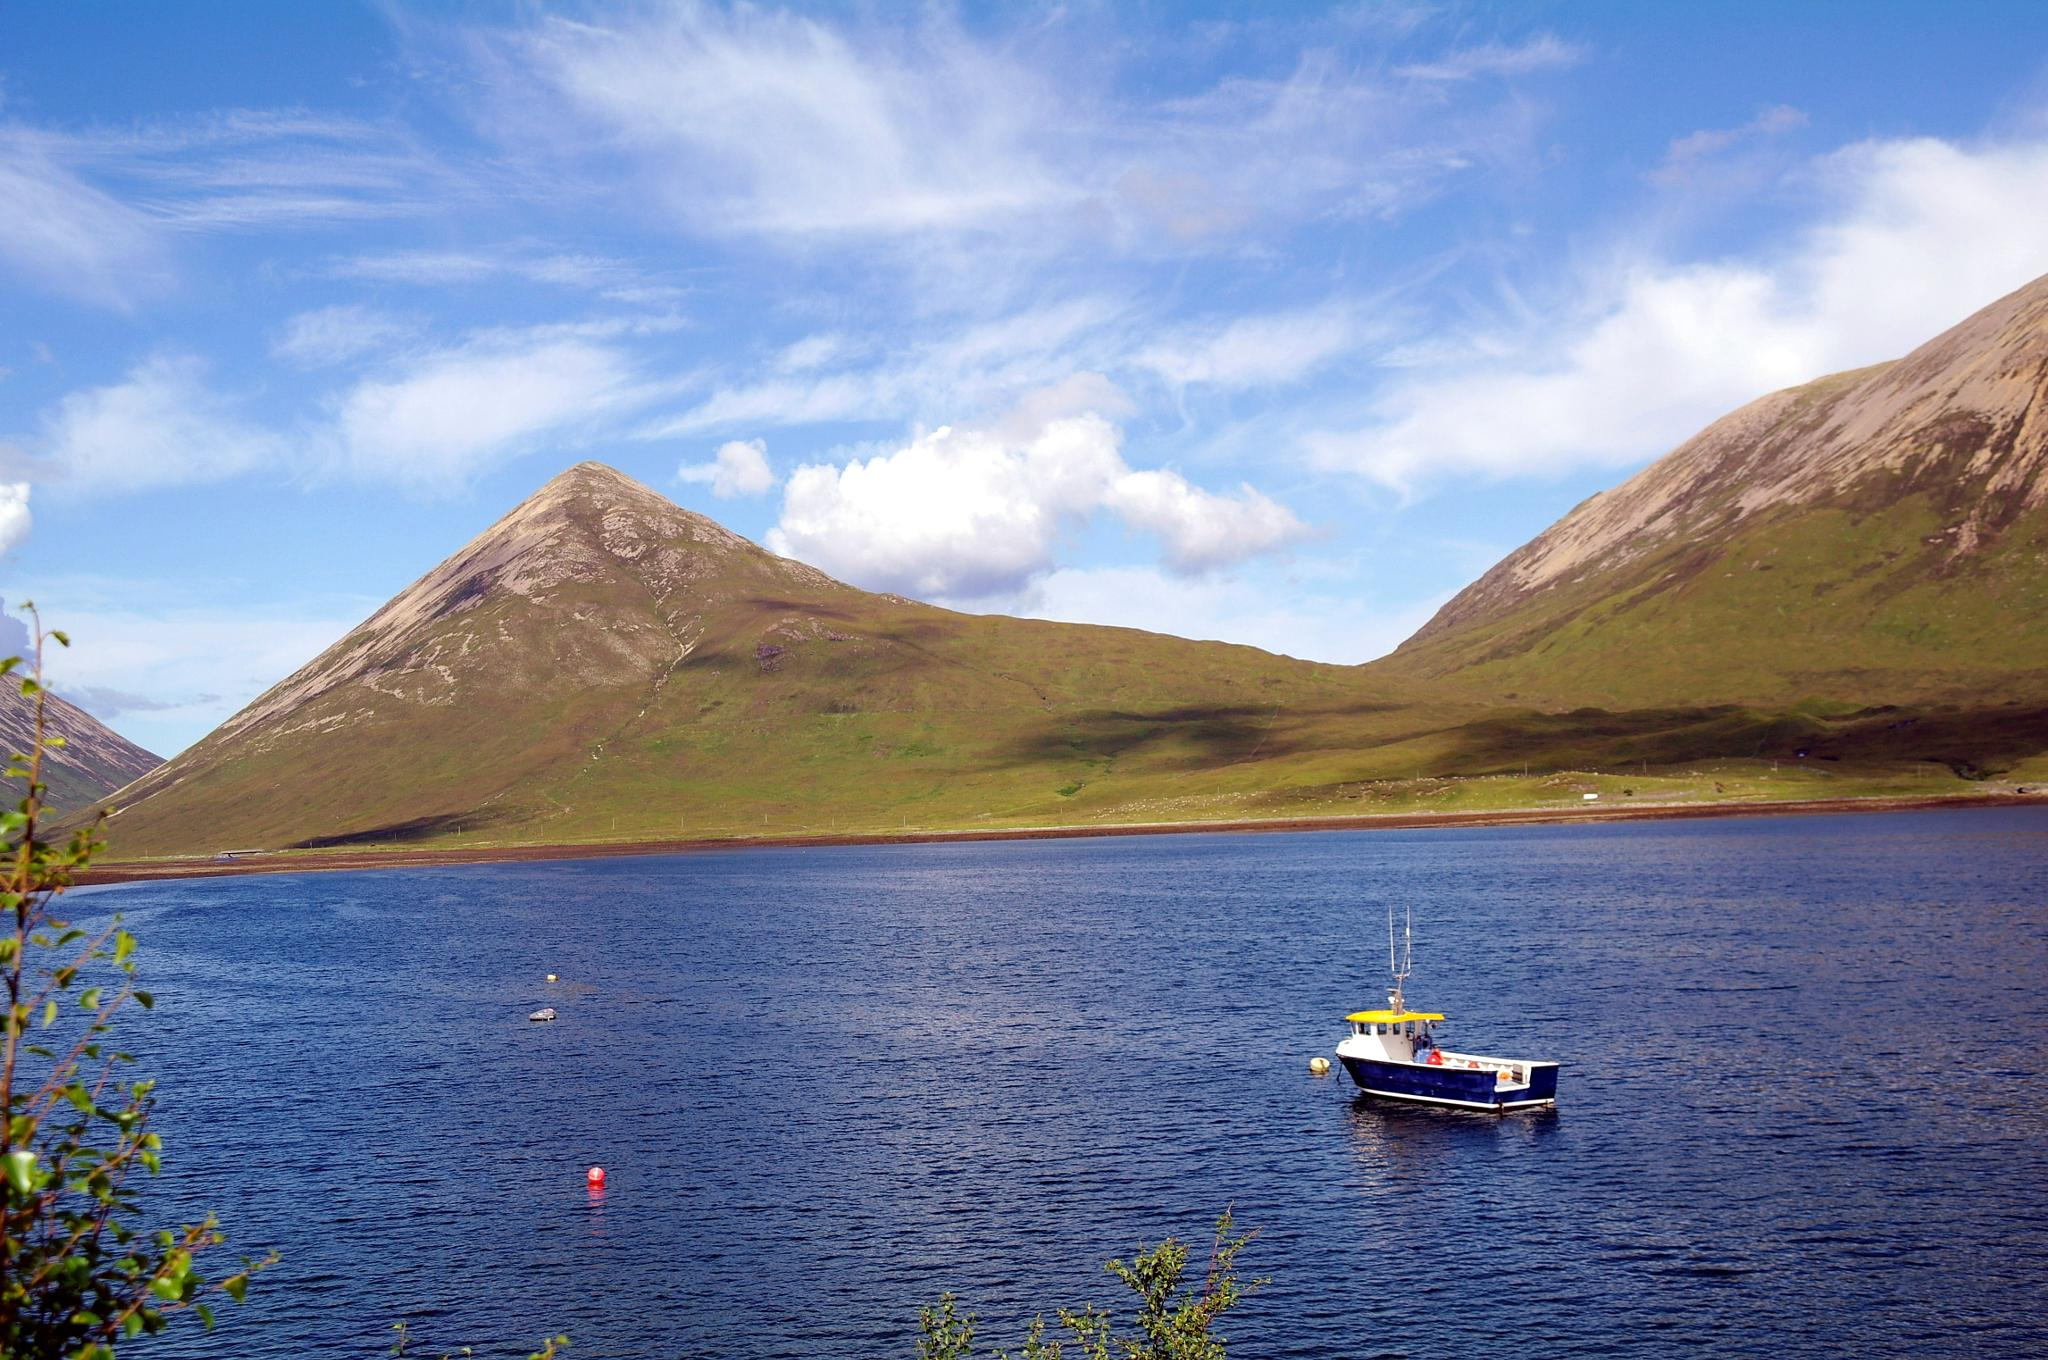 Loch Slappin, Isle of Skye by georgeporteous